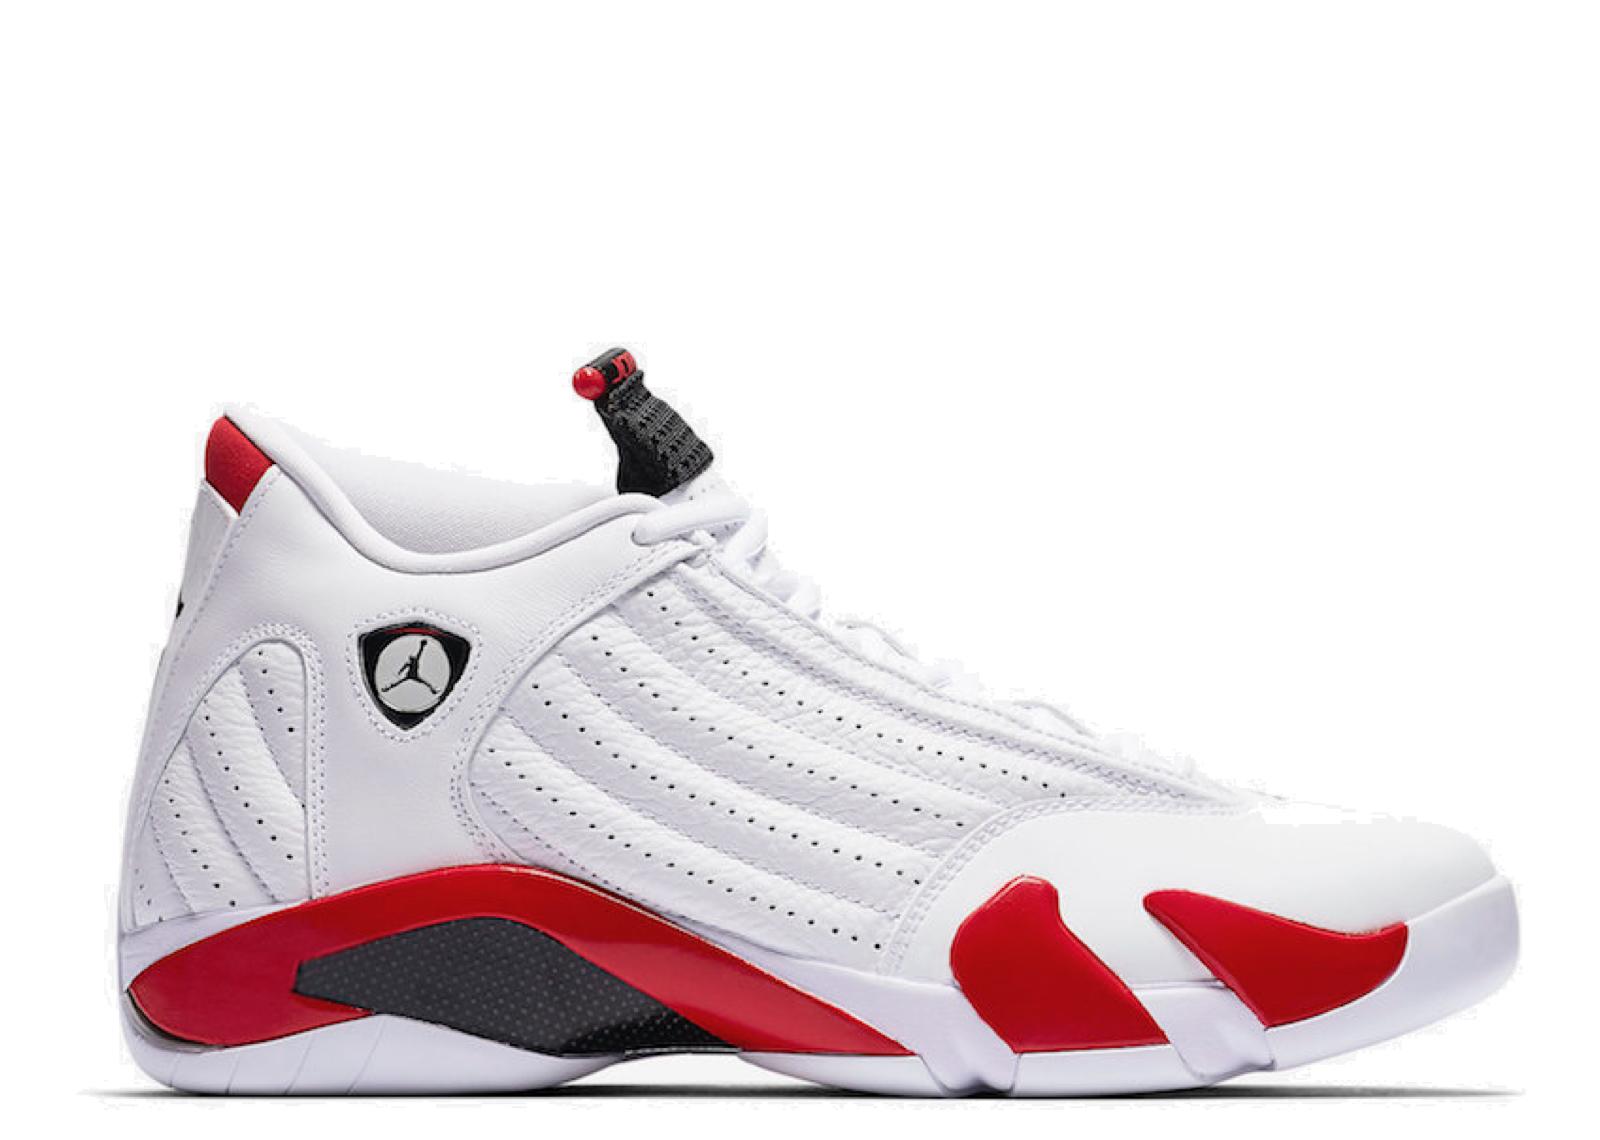 new styles 0003b 7d67e Jordan 14 Retro Rip Hamilton - 0